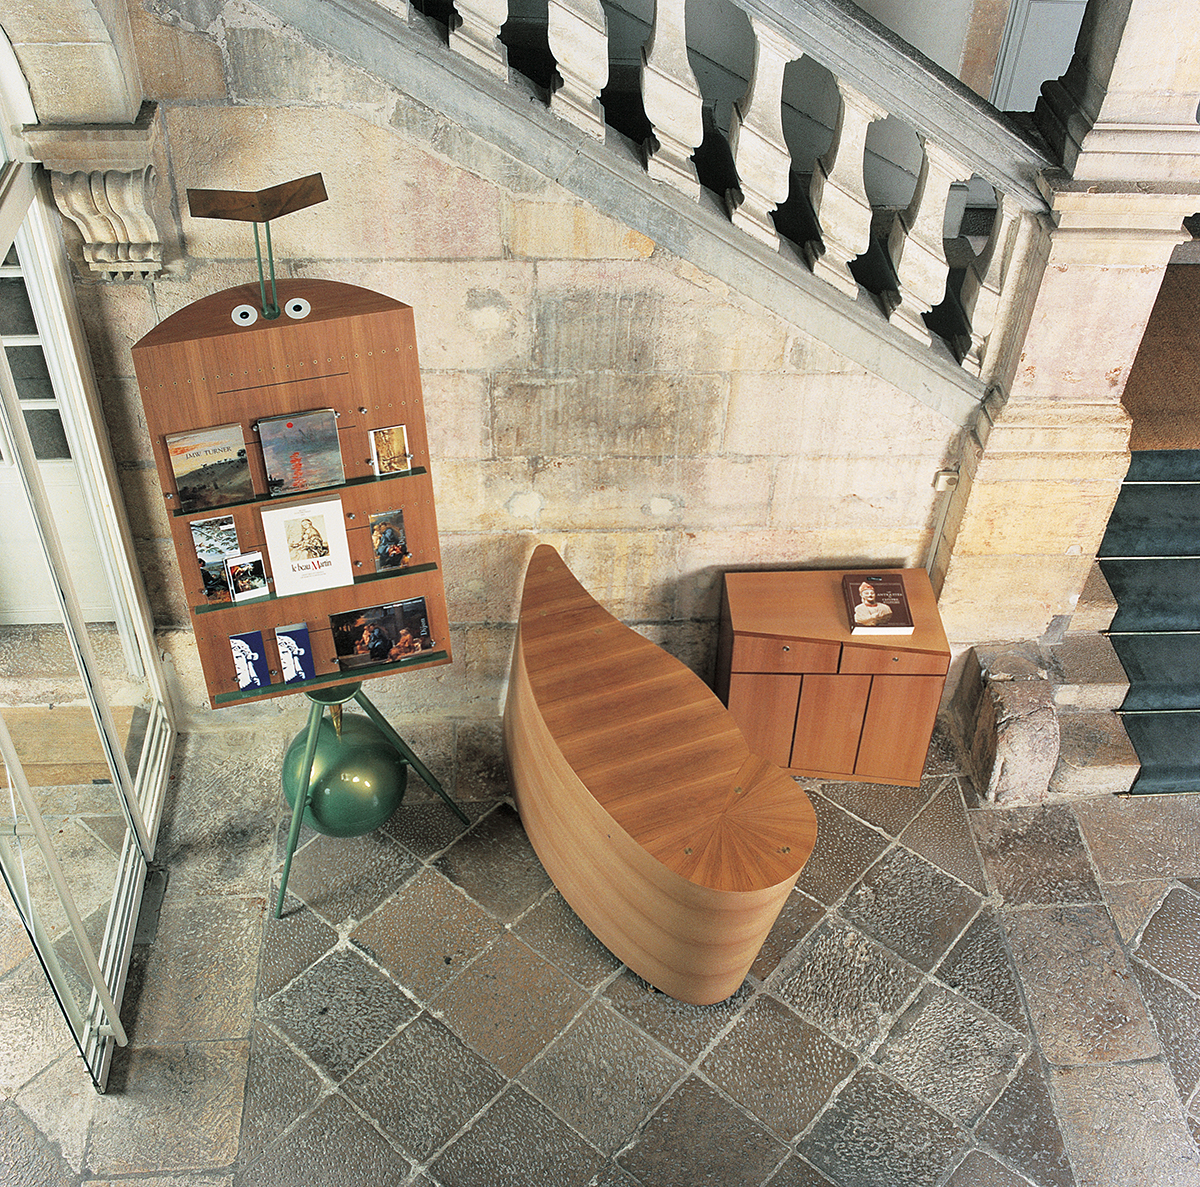 161 - Musée Magnin.jpg